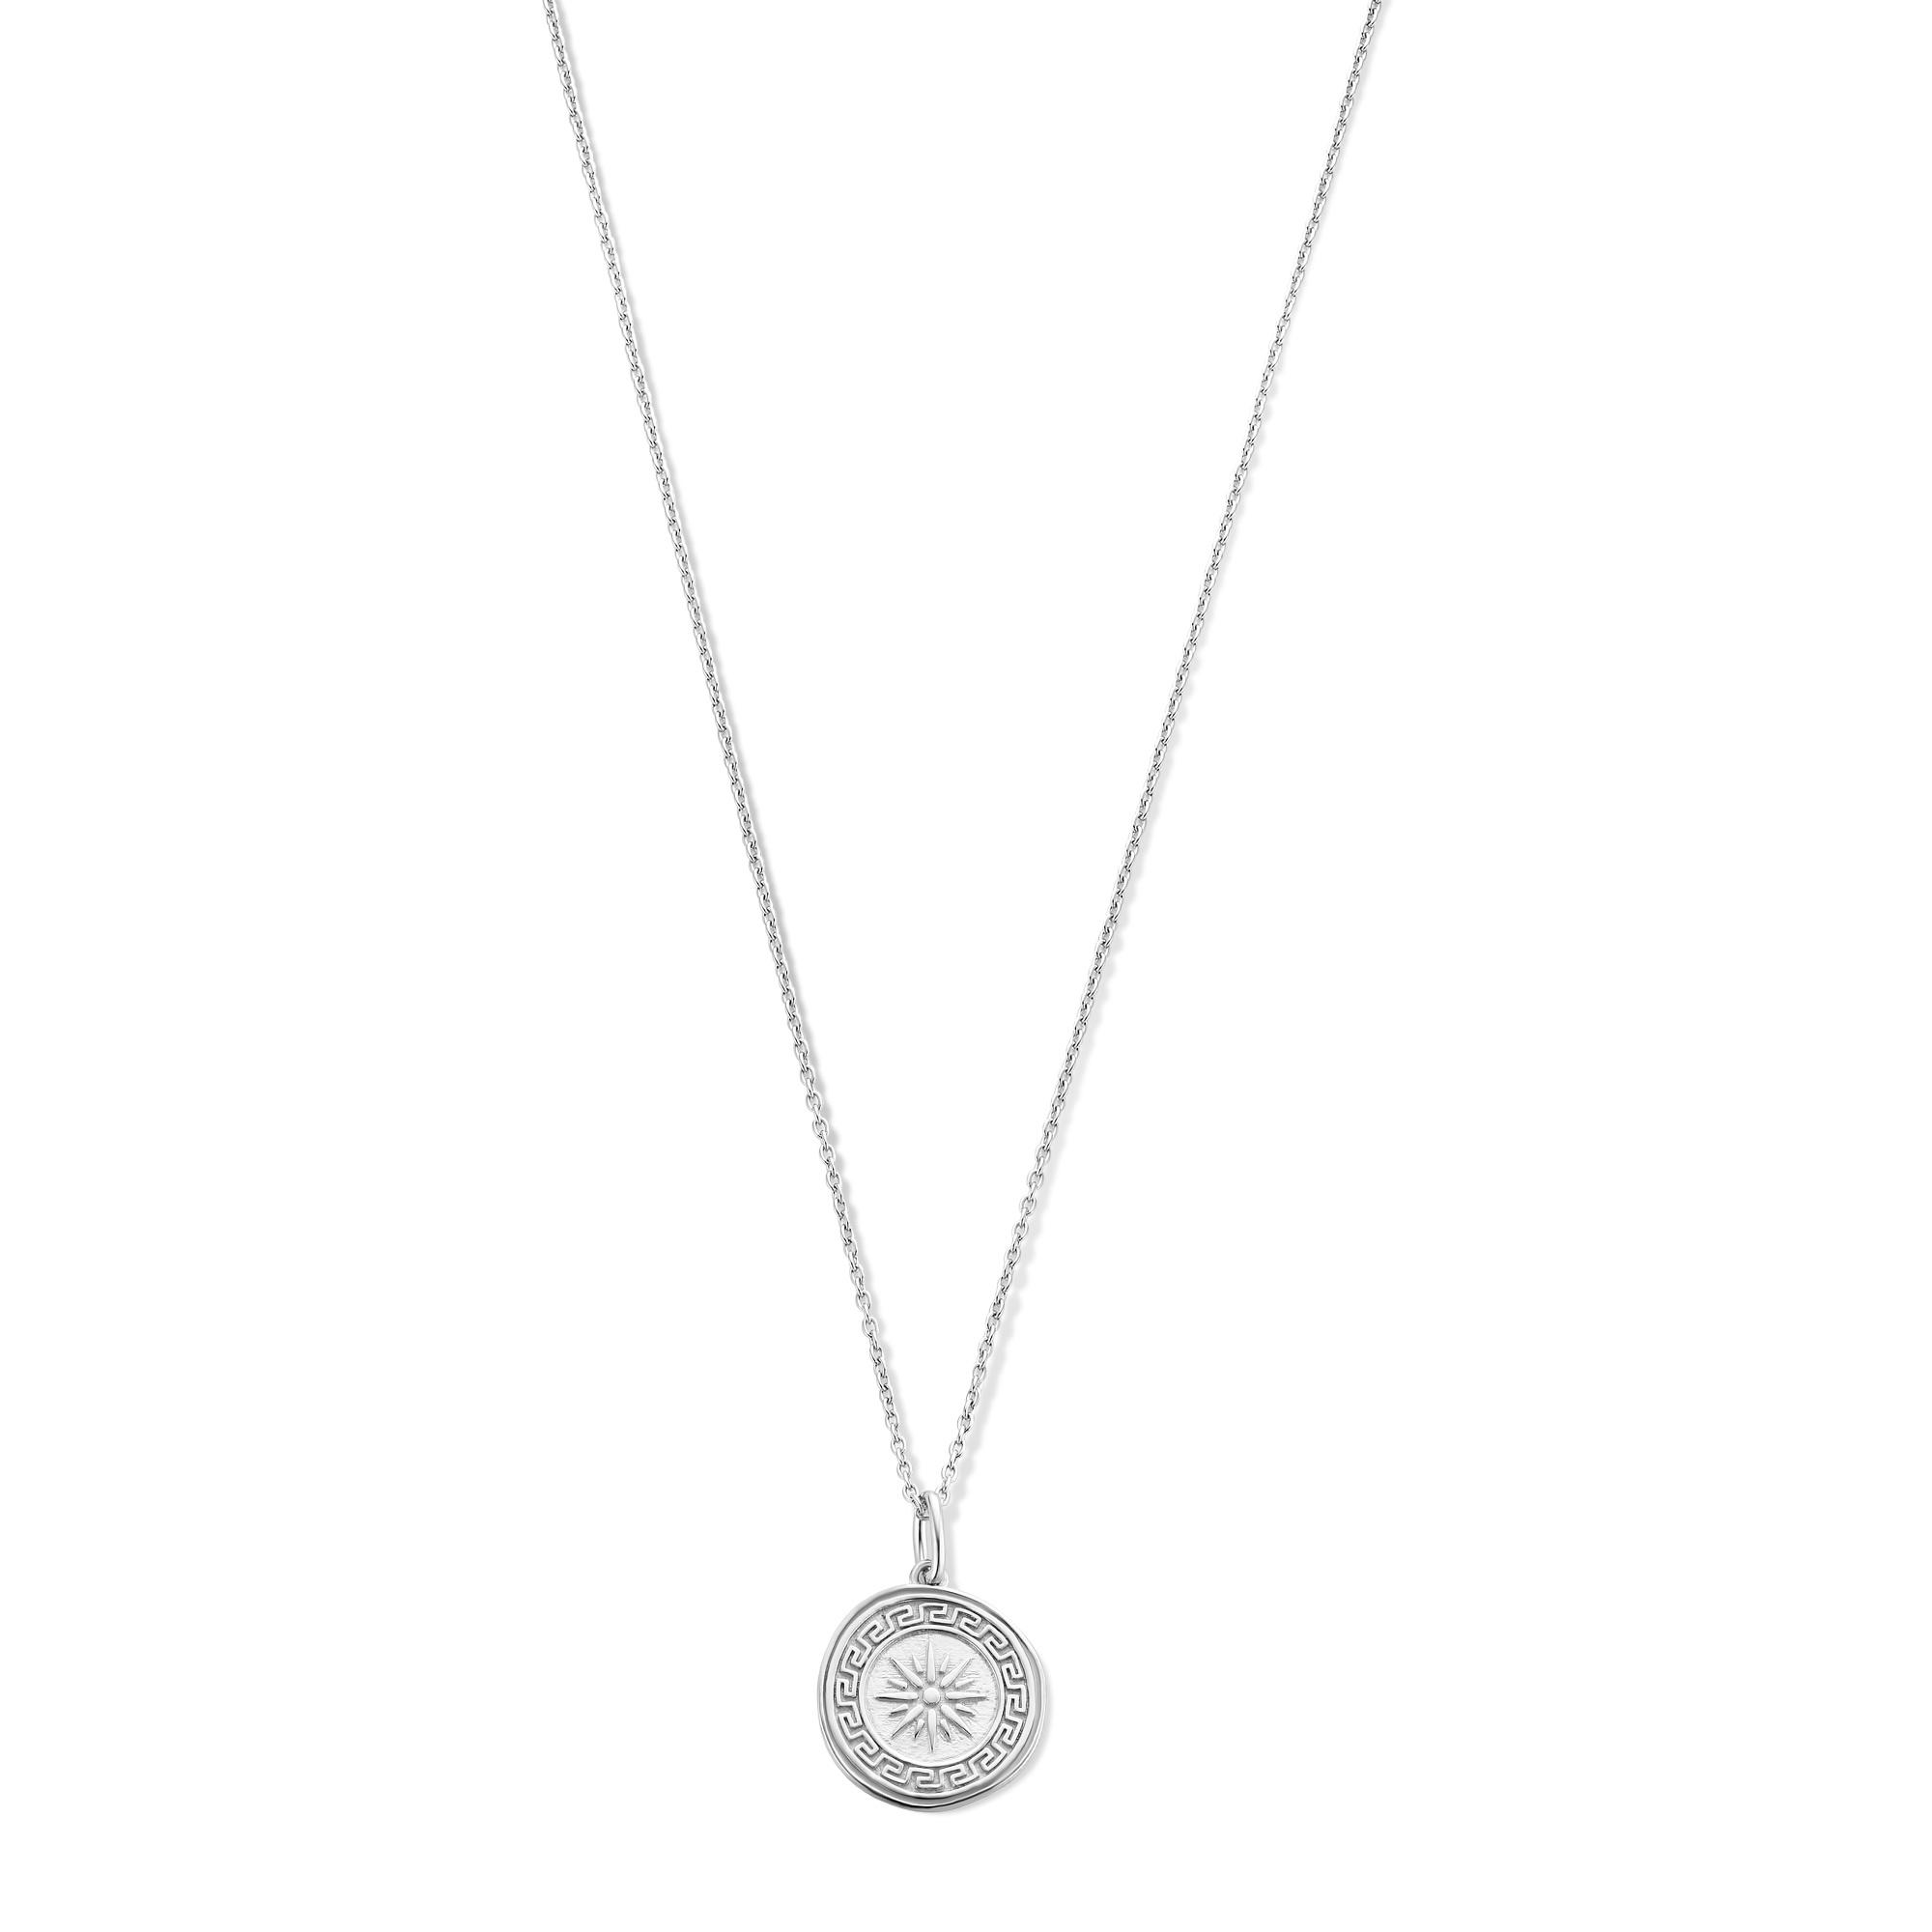 Violet Hamden Athens collana in argento sterling 925